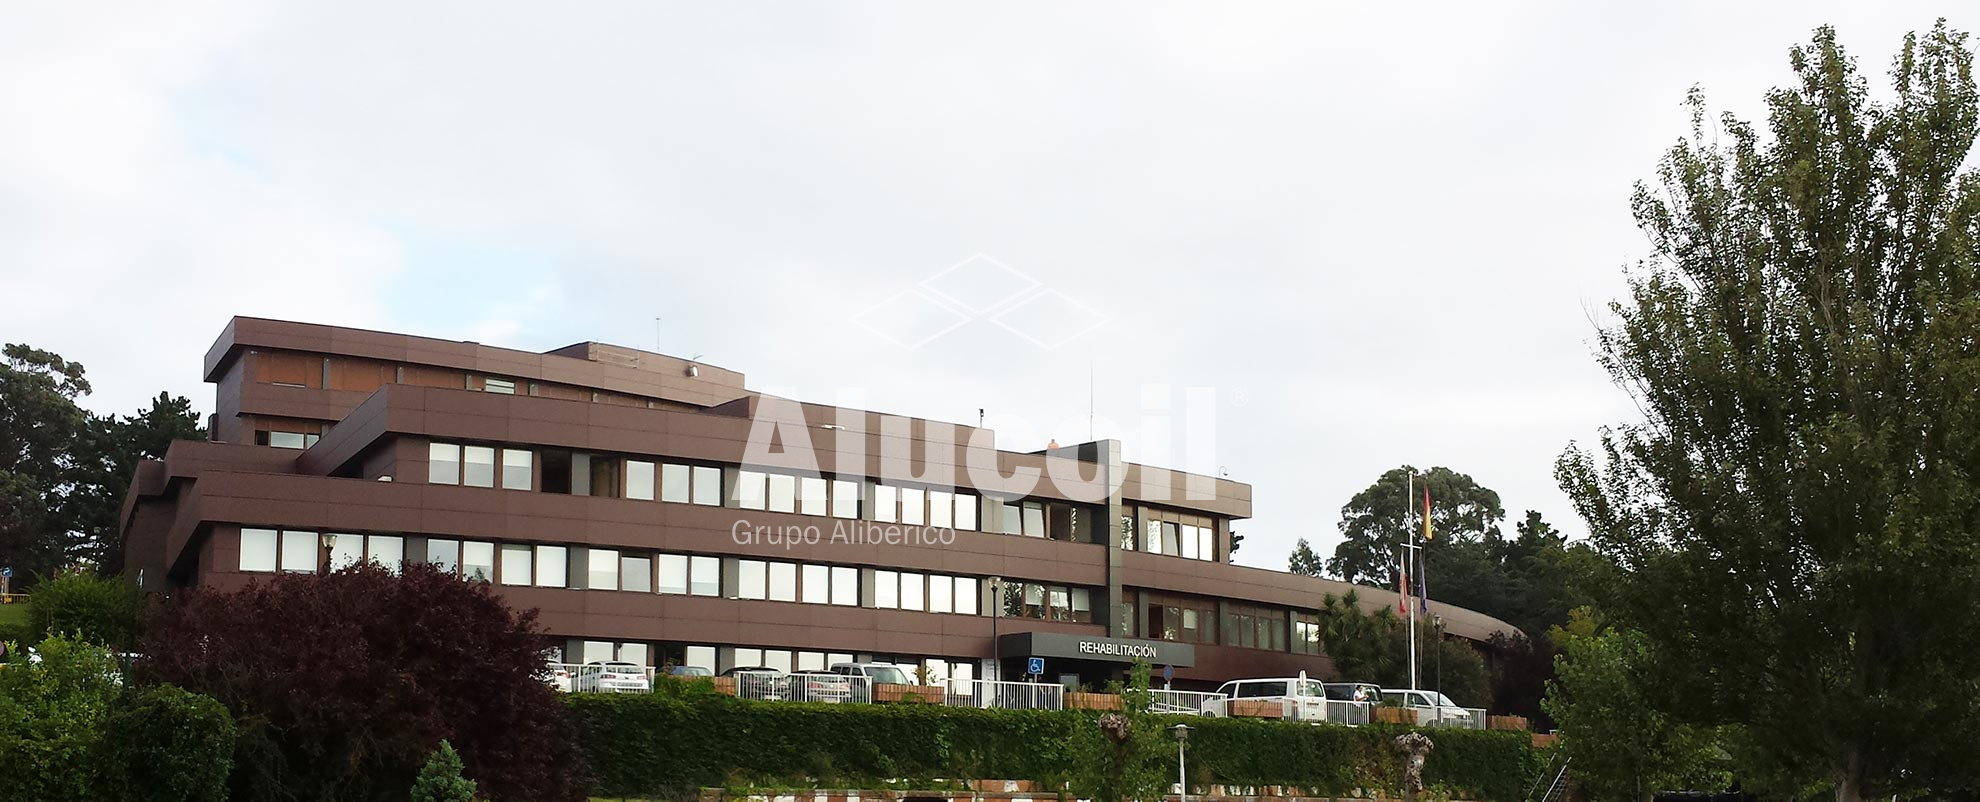 Mutua Montañesa - Hospital Ramón Negrete